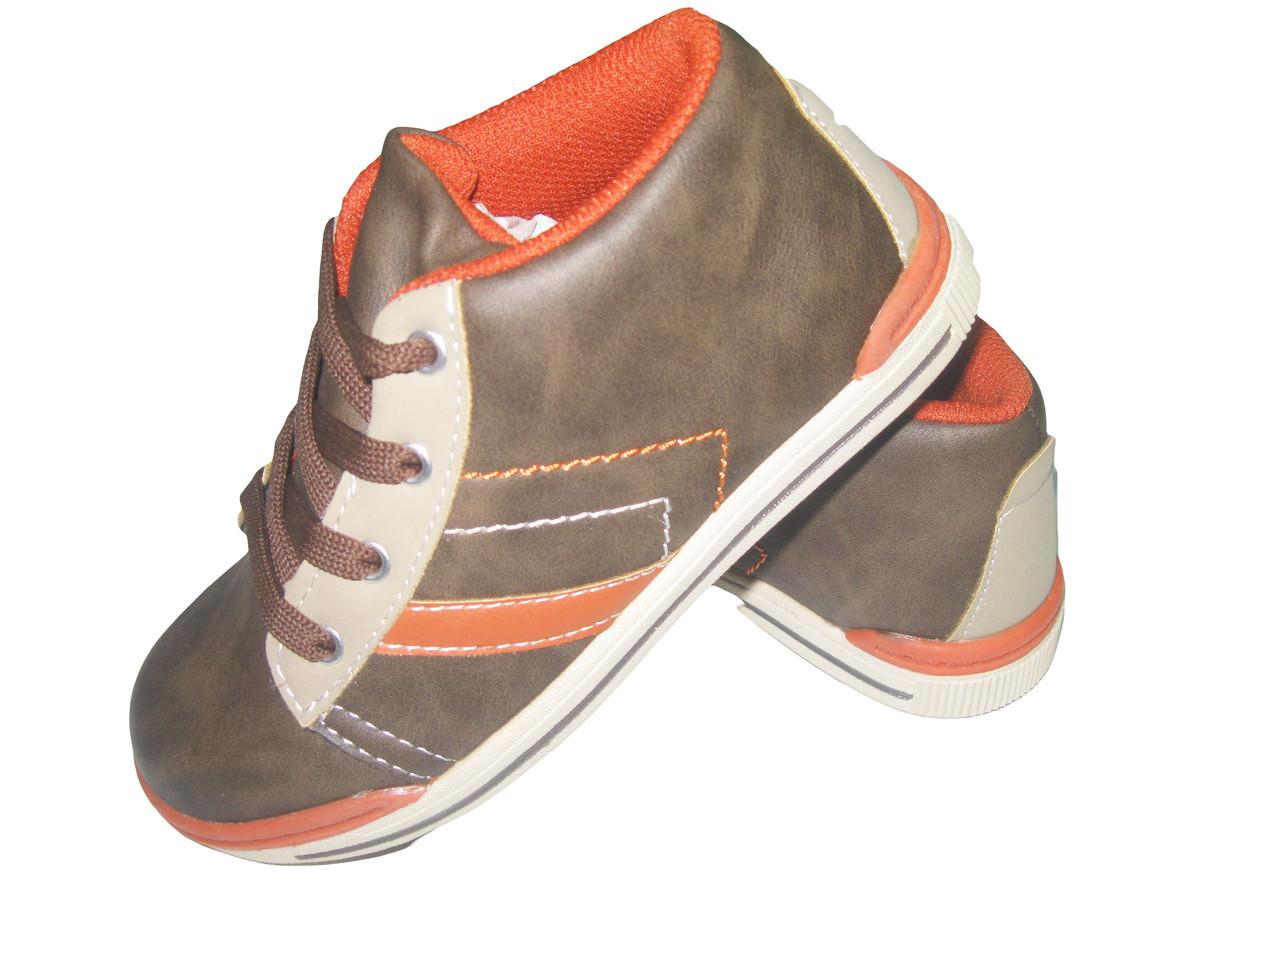 Ботинки для мальчика, Lupilu, размер 29р арт. Л-238/1